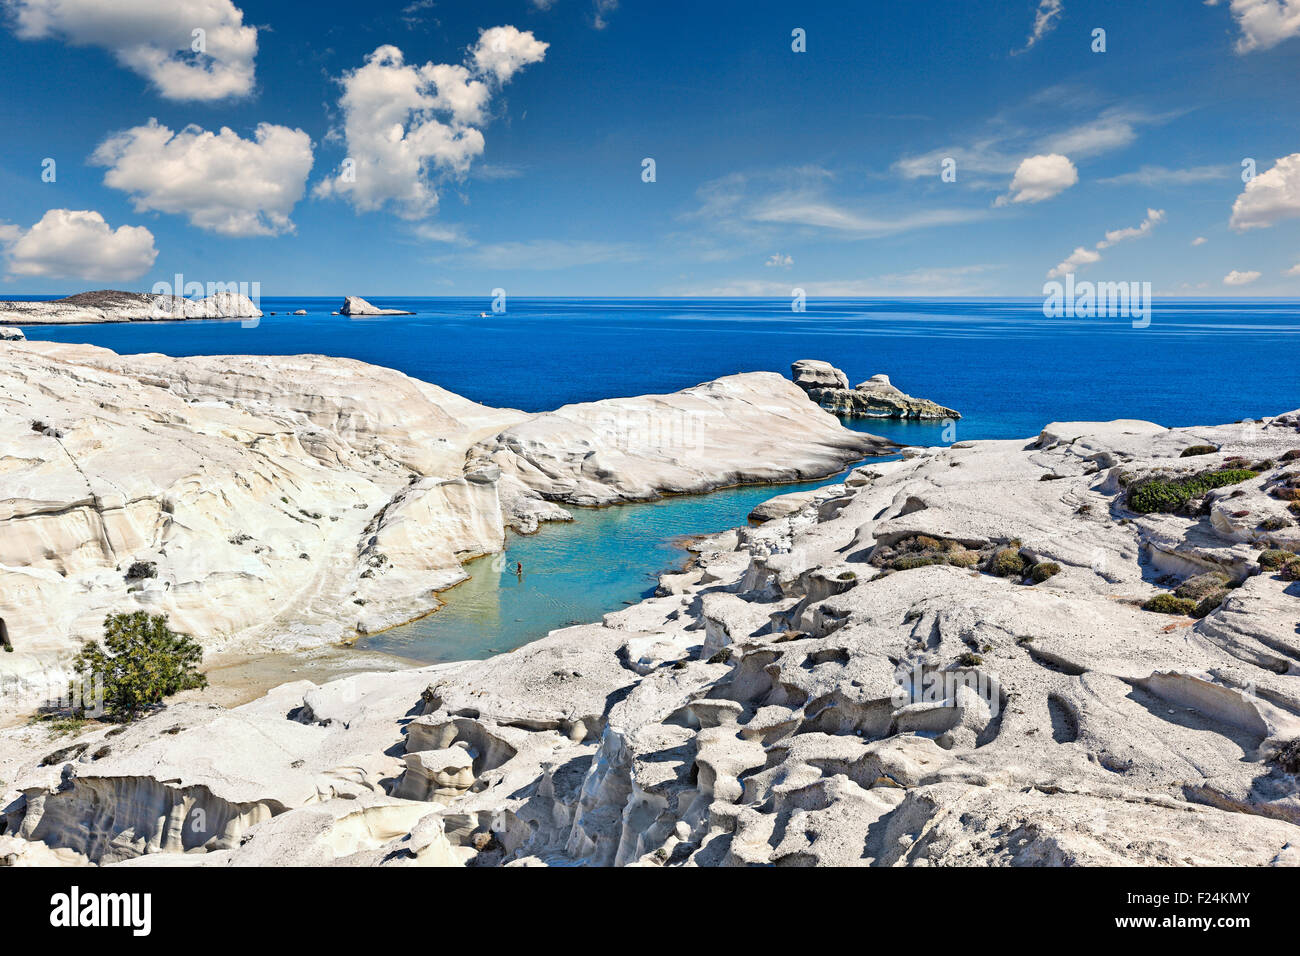 El famoso Sarakiniko en Milos, Grecia Imagen De Stock